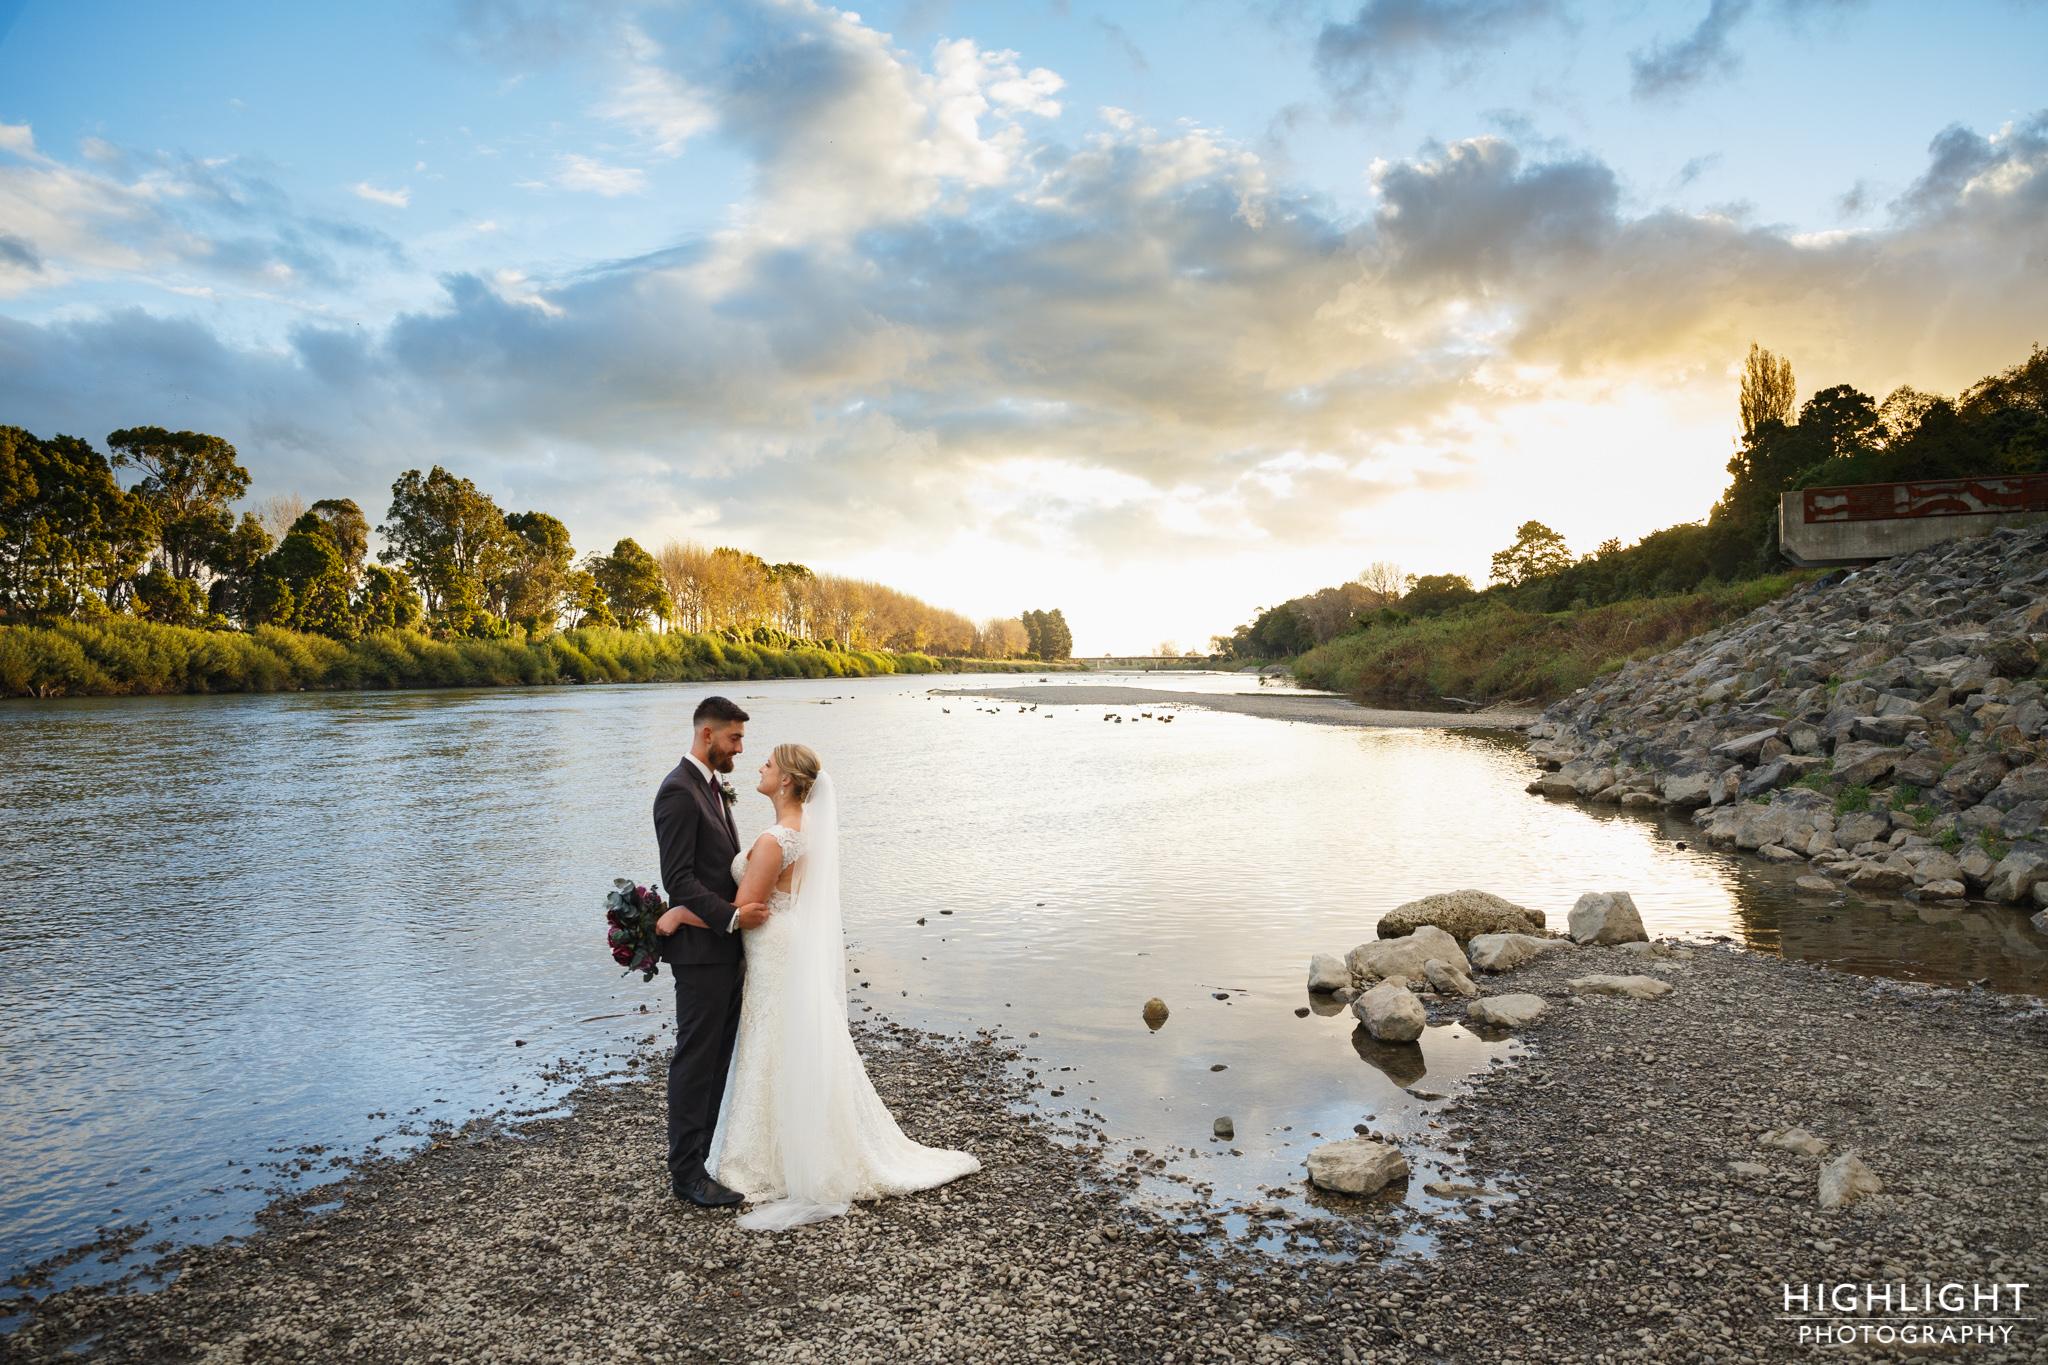 highlight-wedding-photography-feilding-new-zealand-160.jpg